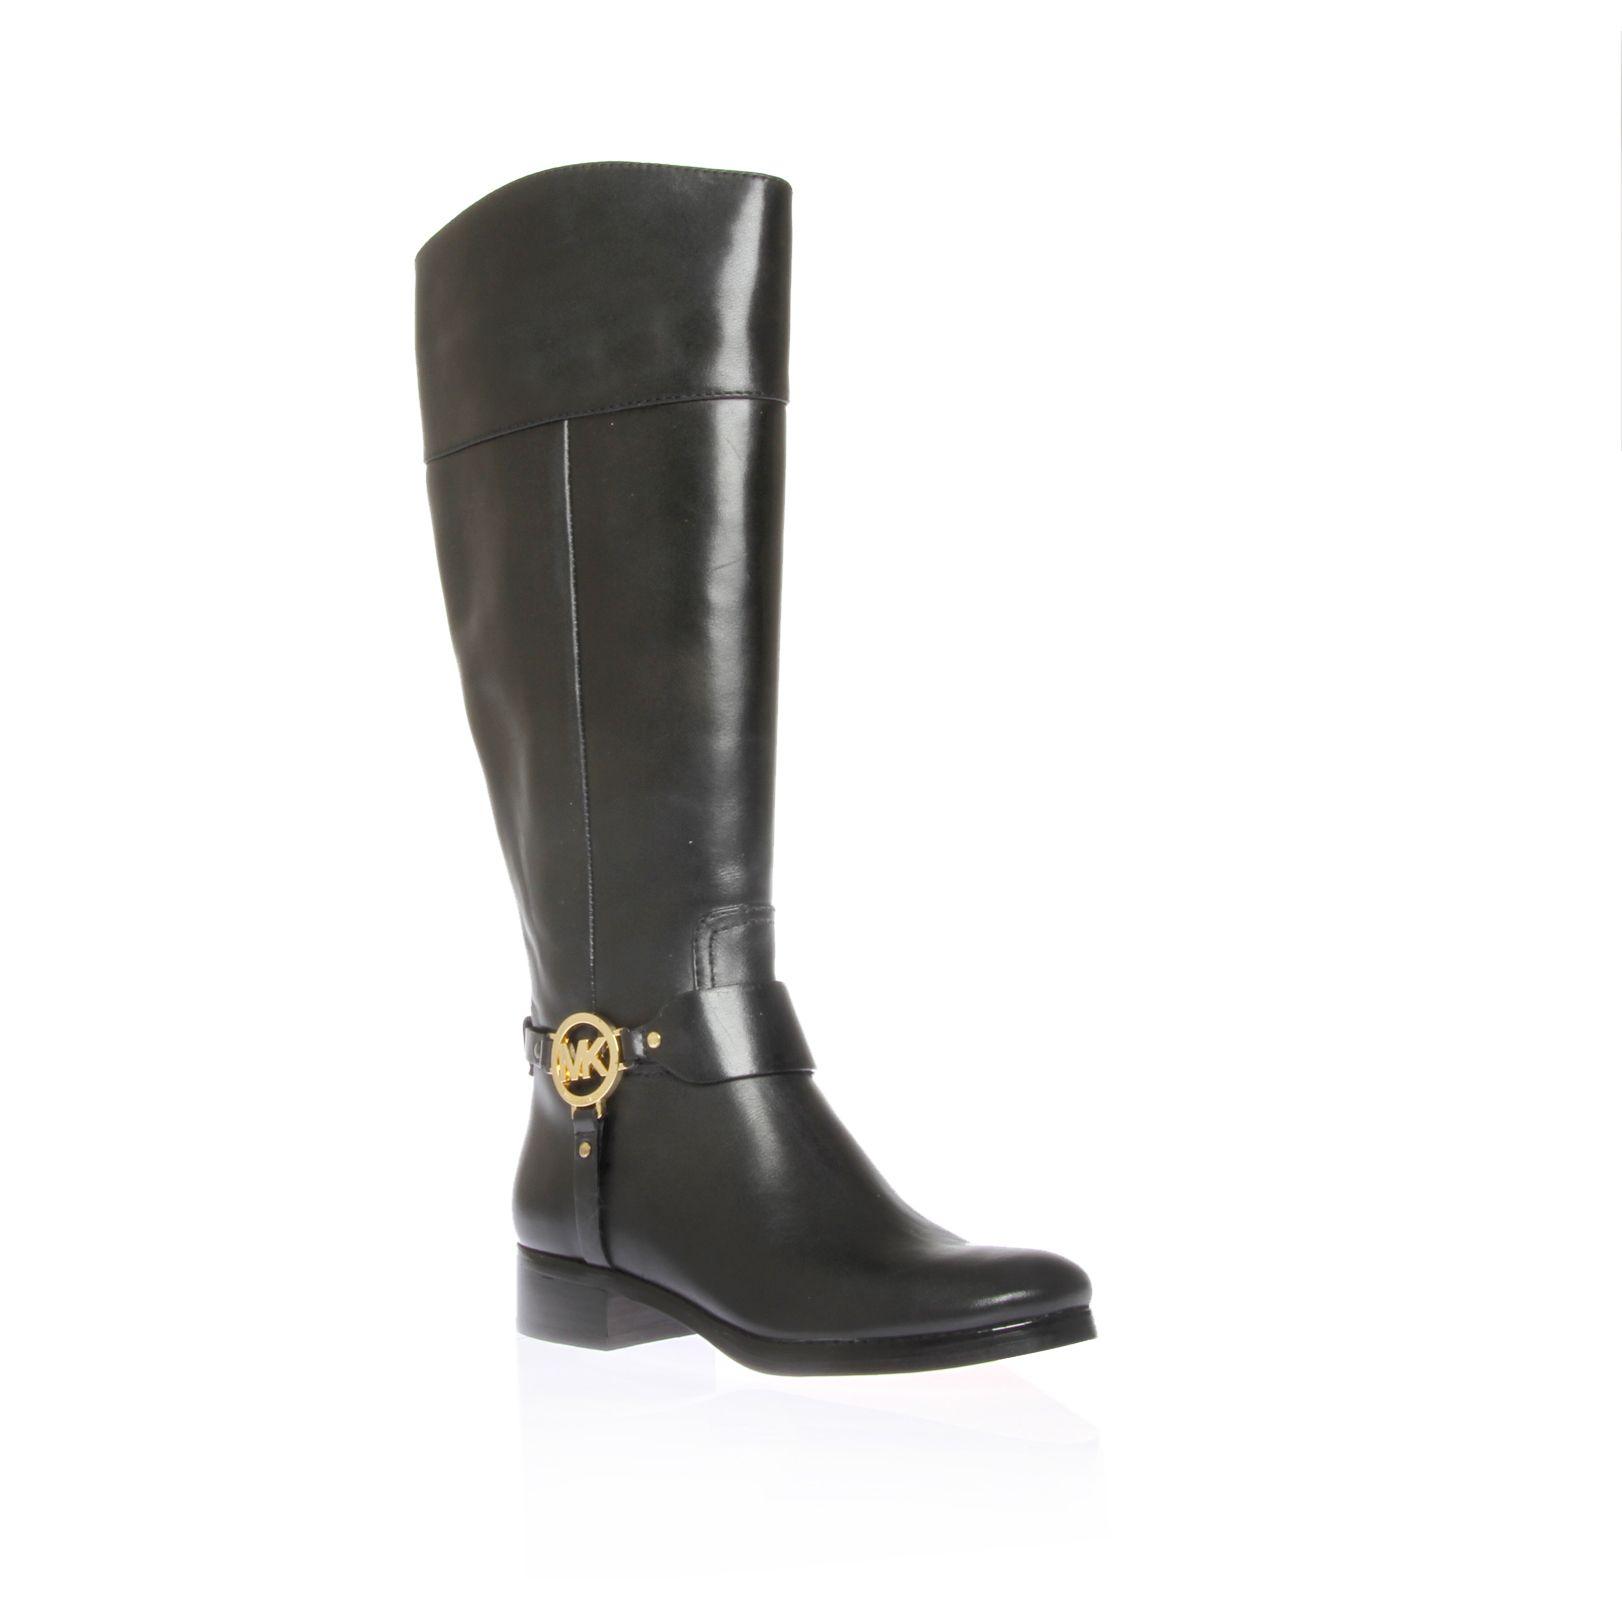 Womens Michael Kors Shoes Uk